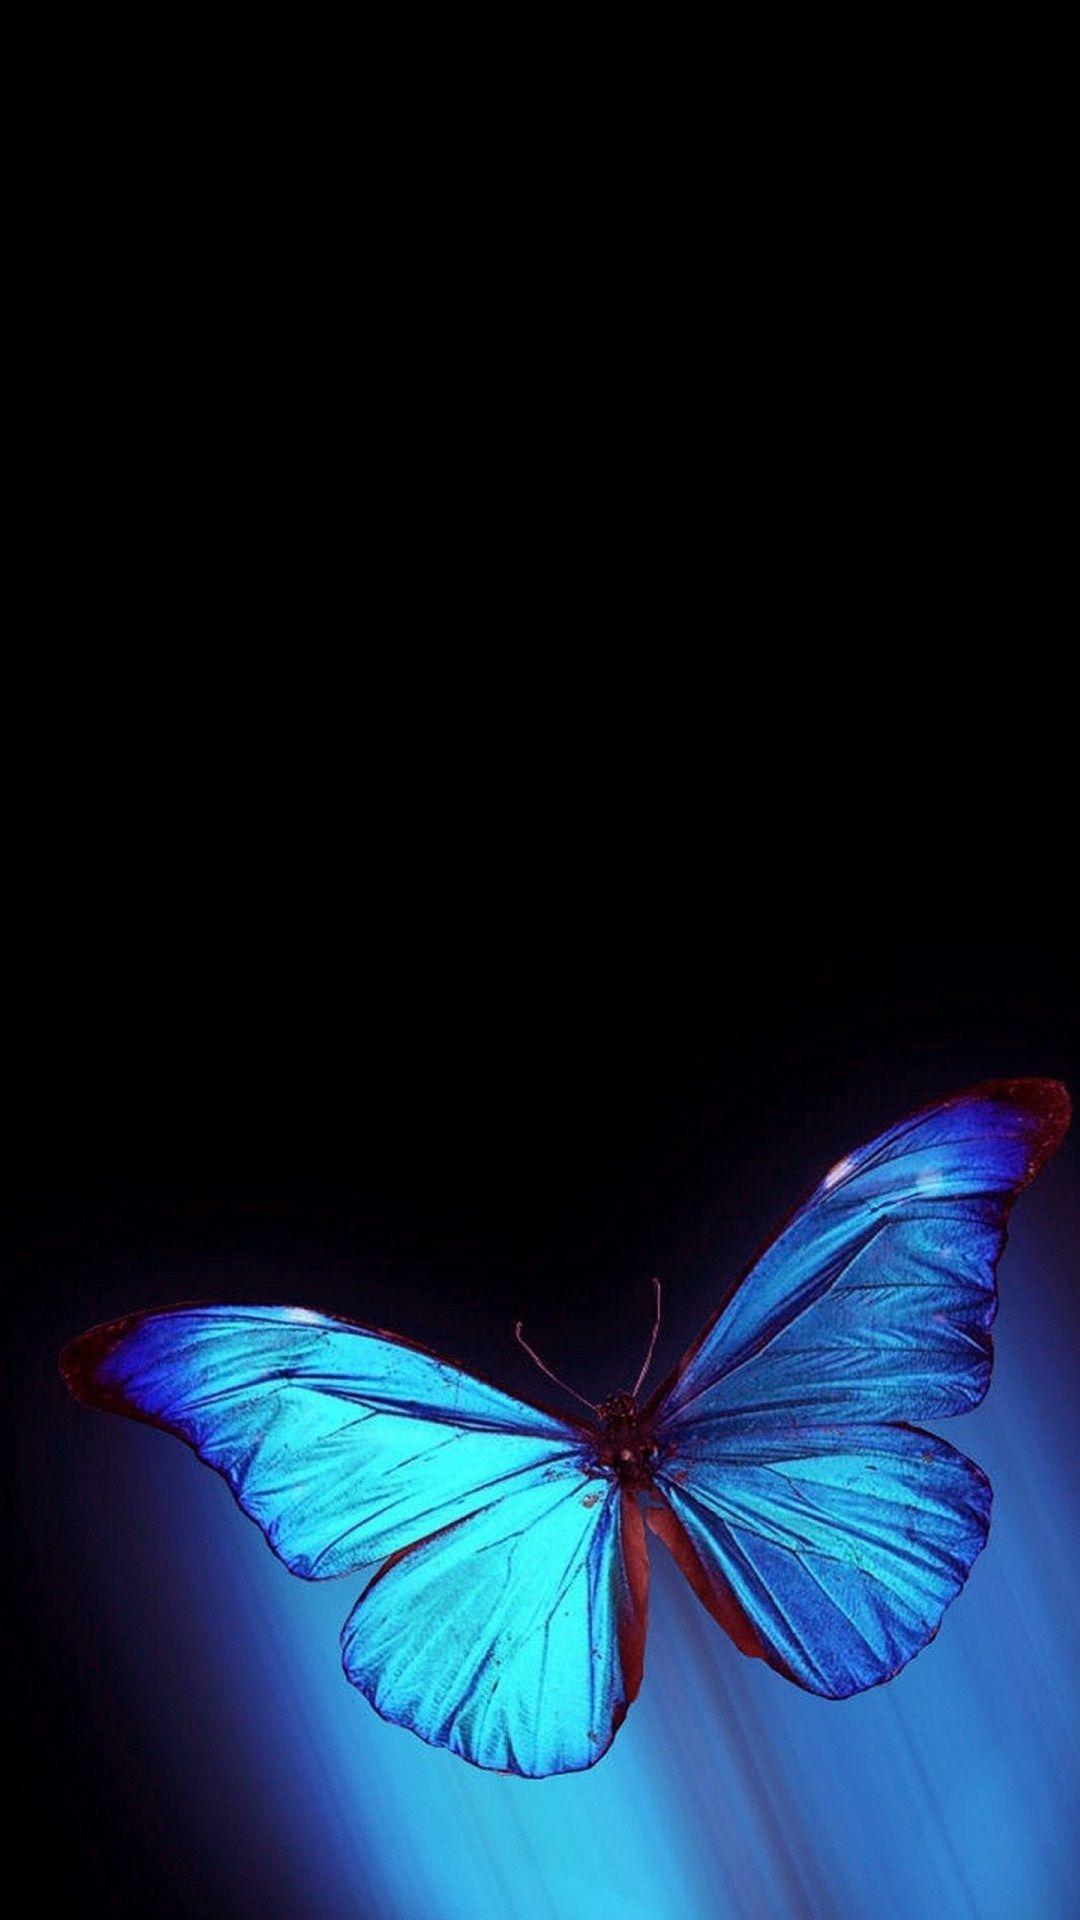 Iphone Wallpaper Hd Blue Butterfly Is The Best High Resolution Screensaver Butterfly Wallpaper Iphone Blue Butterfly Wallpaper Butterfly Wallpaper Backgrounds